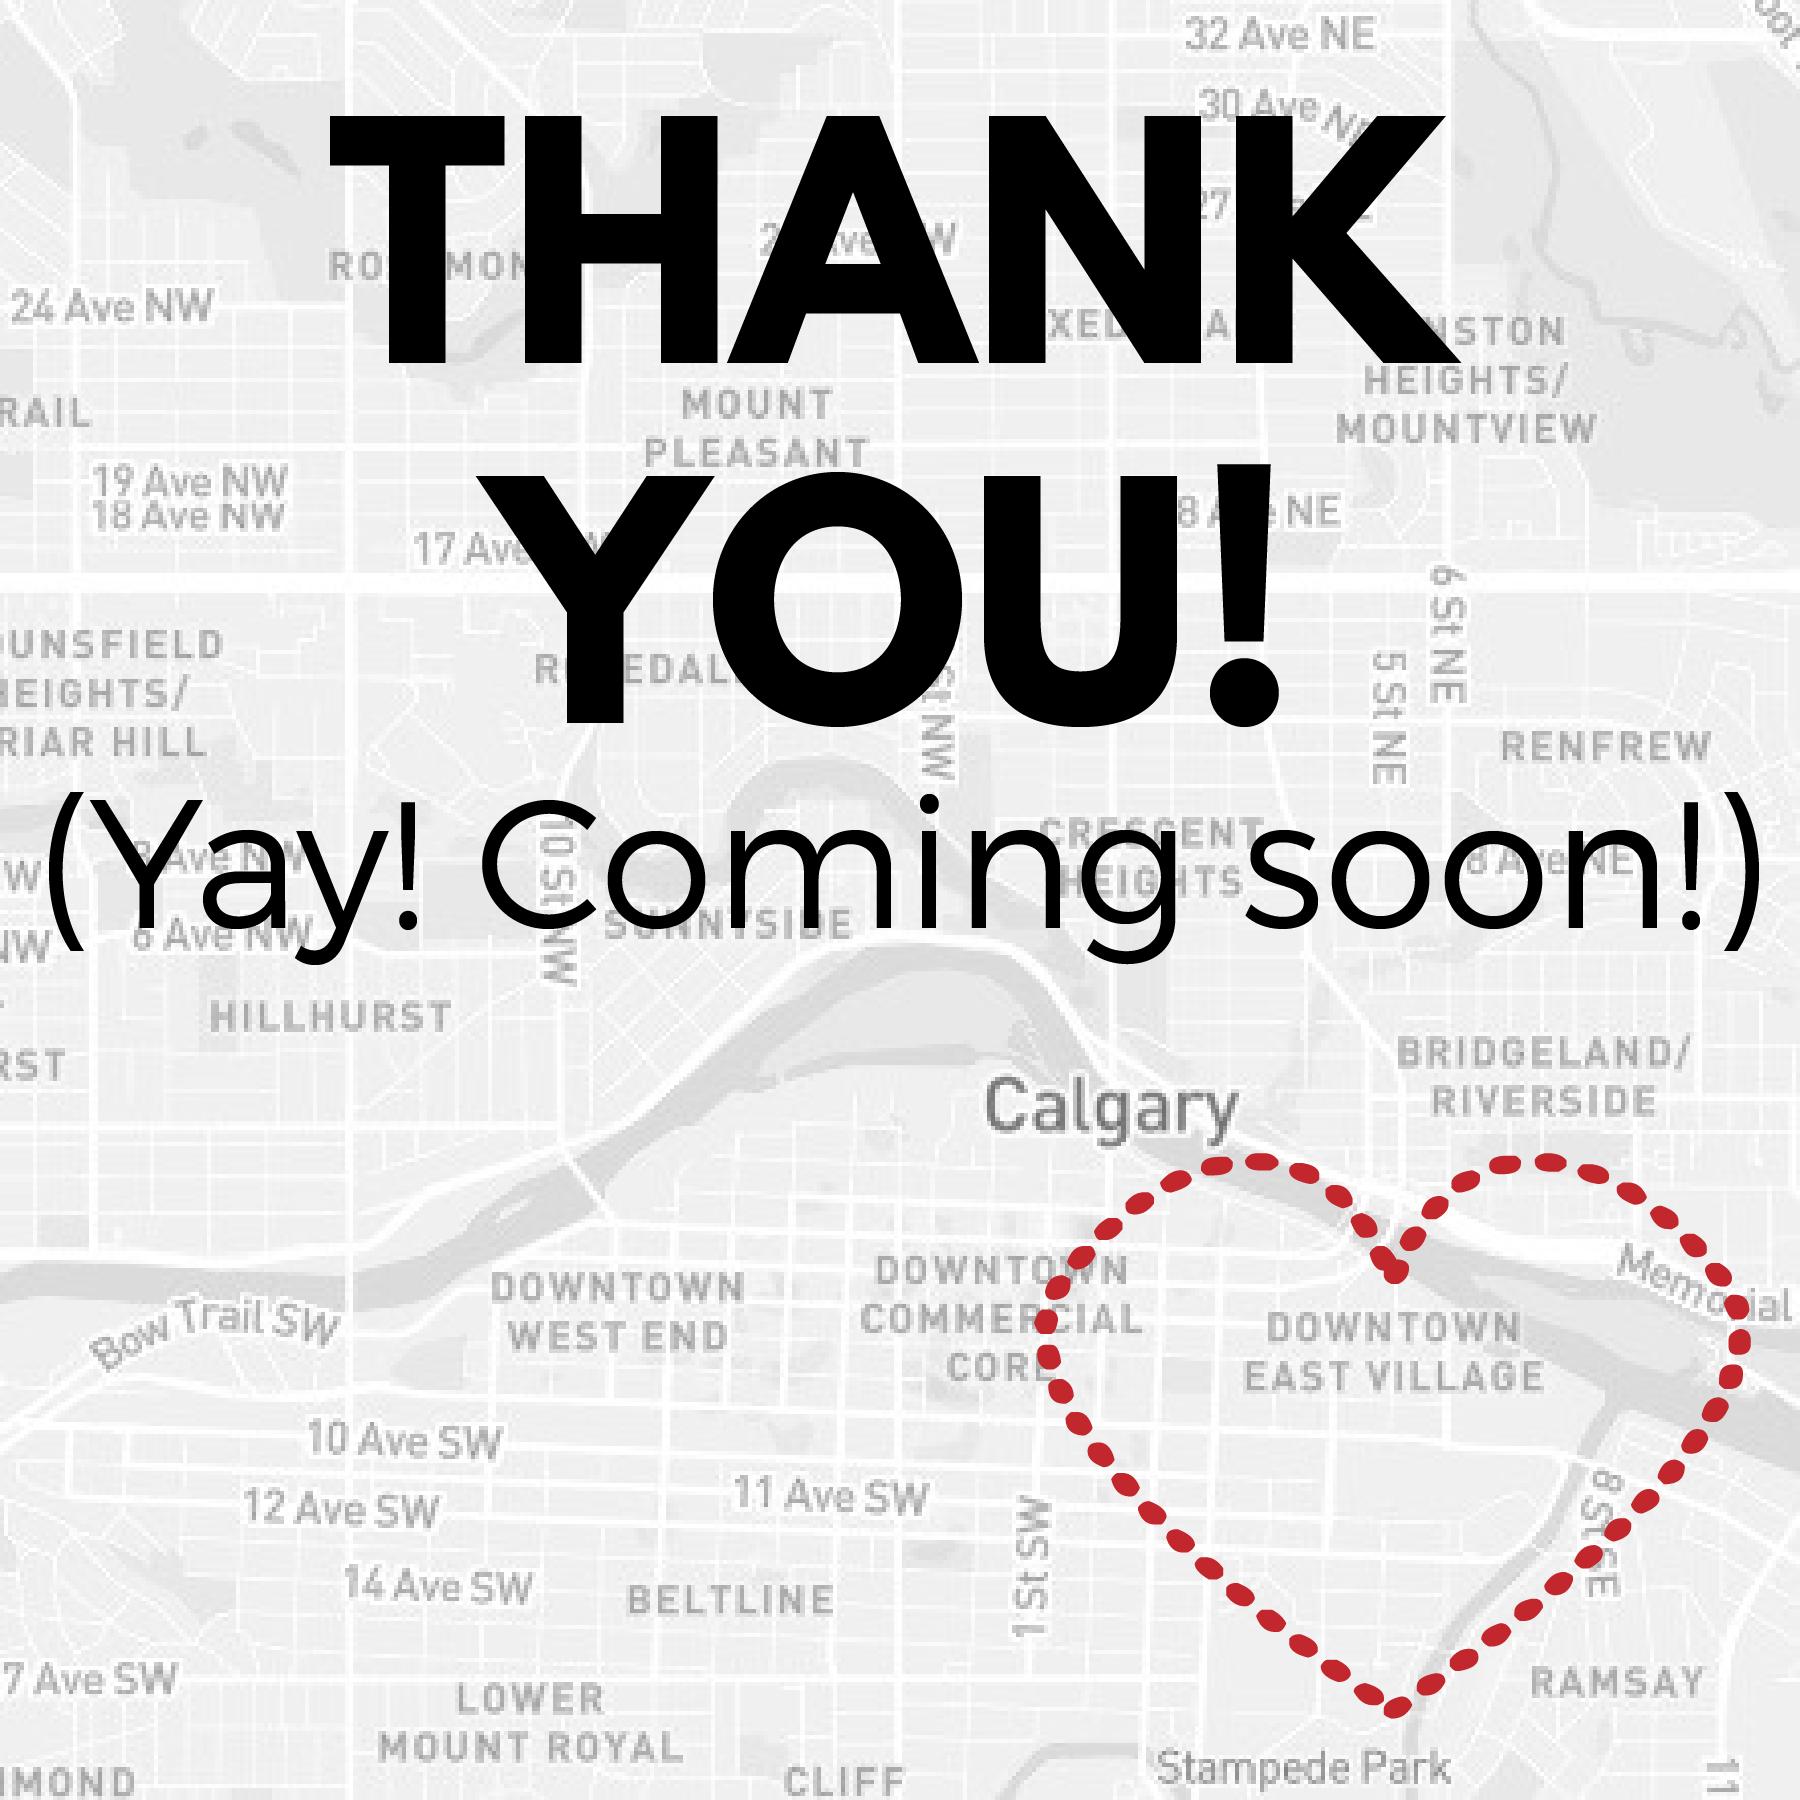 East Village Calgary RedBloom Salon coming soon!